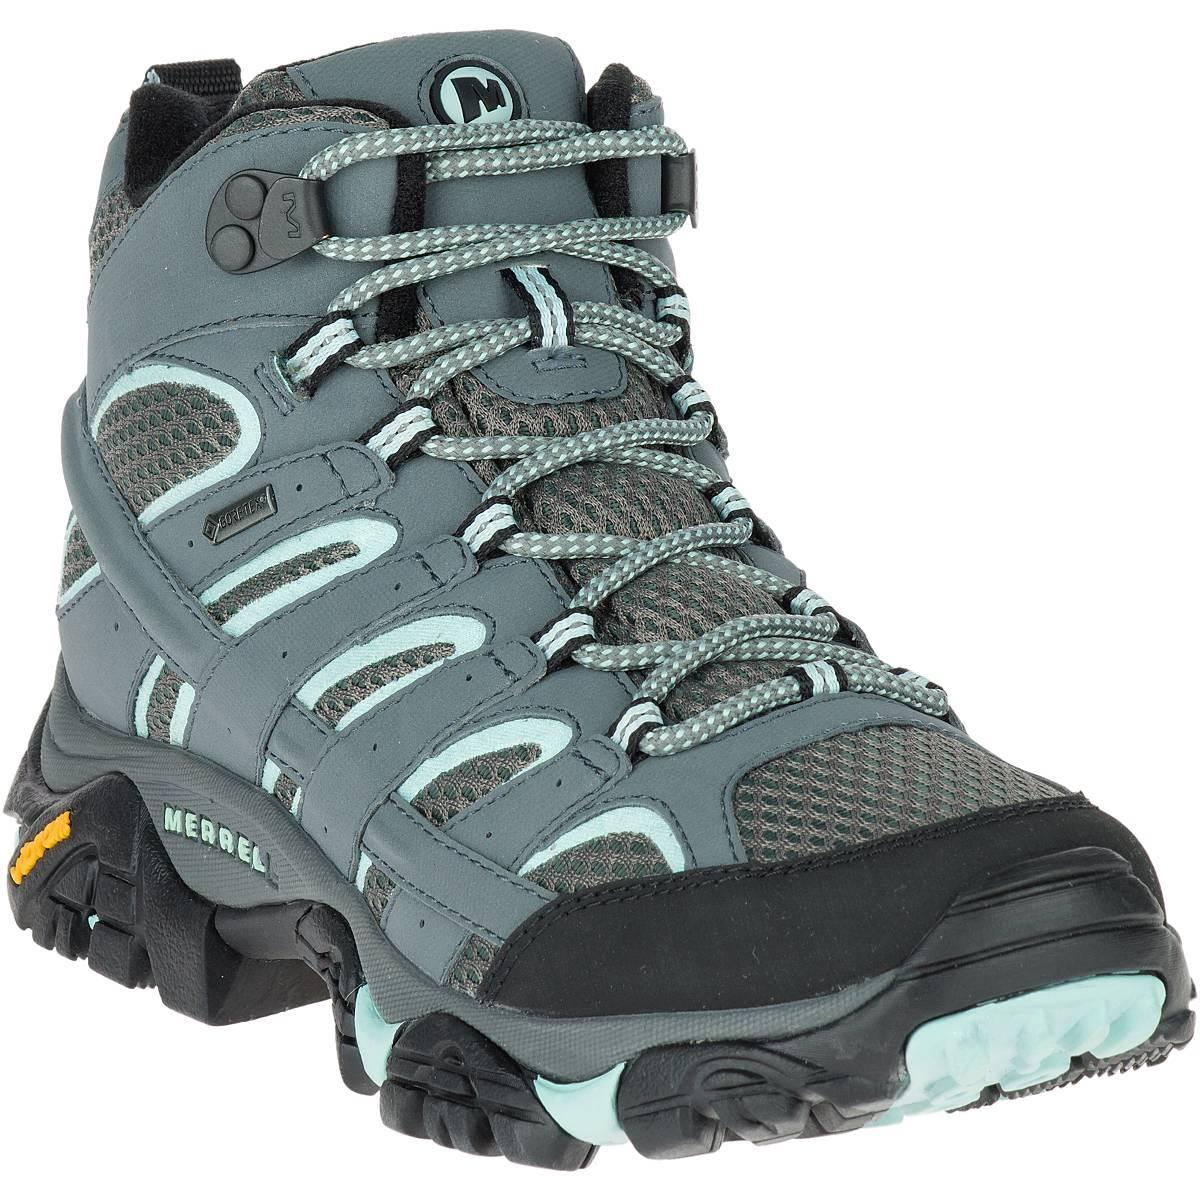 212dce8d0a5 Merrell Moab 2 MID GTX Walking Boots (Women's) - Sedona Sage